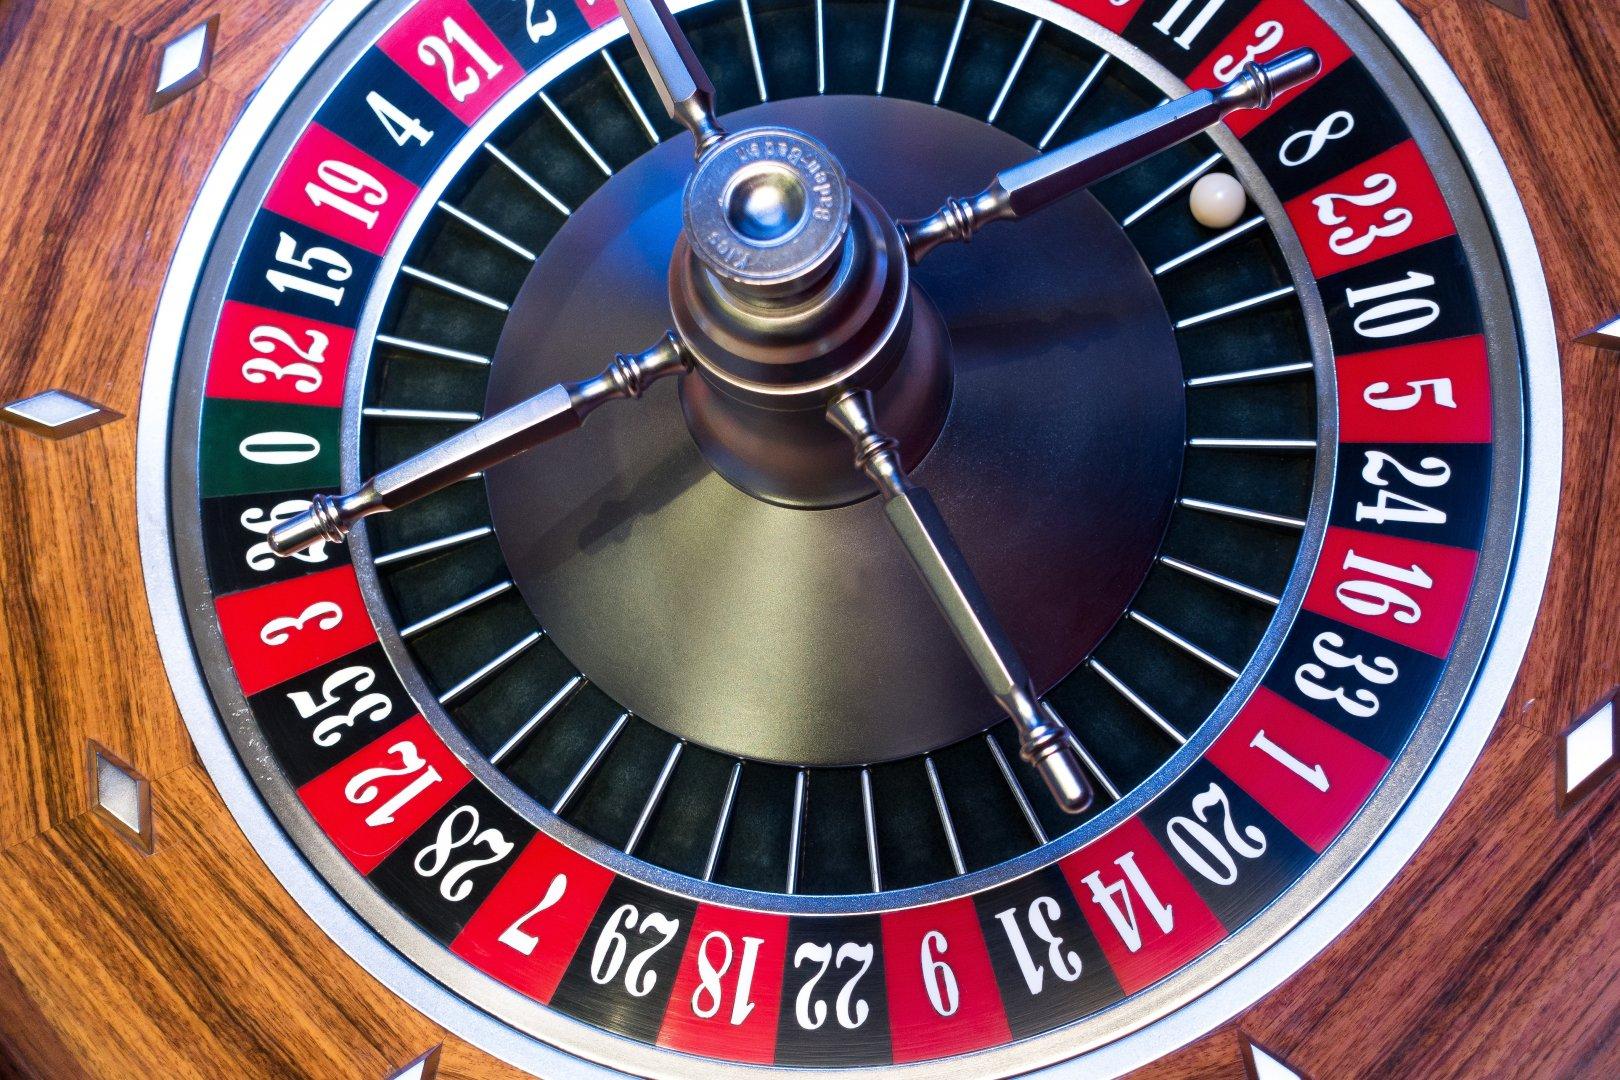 kazino-moshennichestvo-ruletka